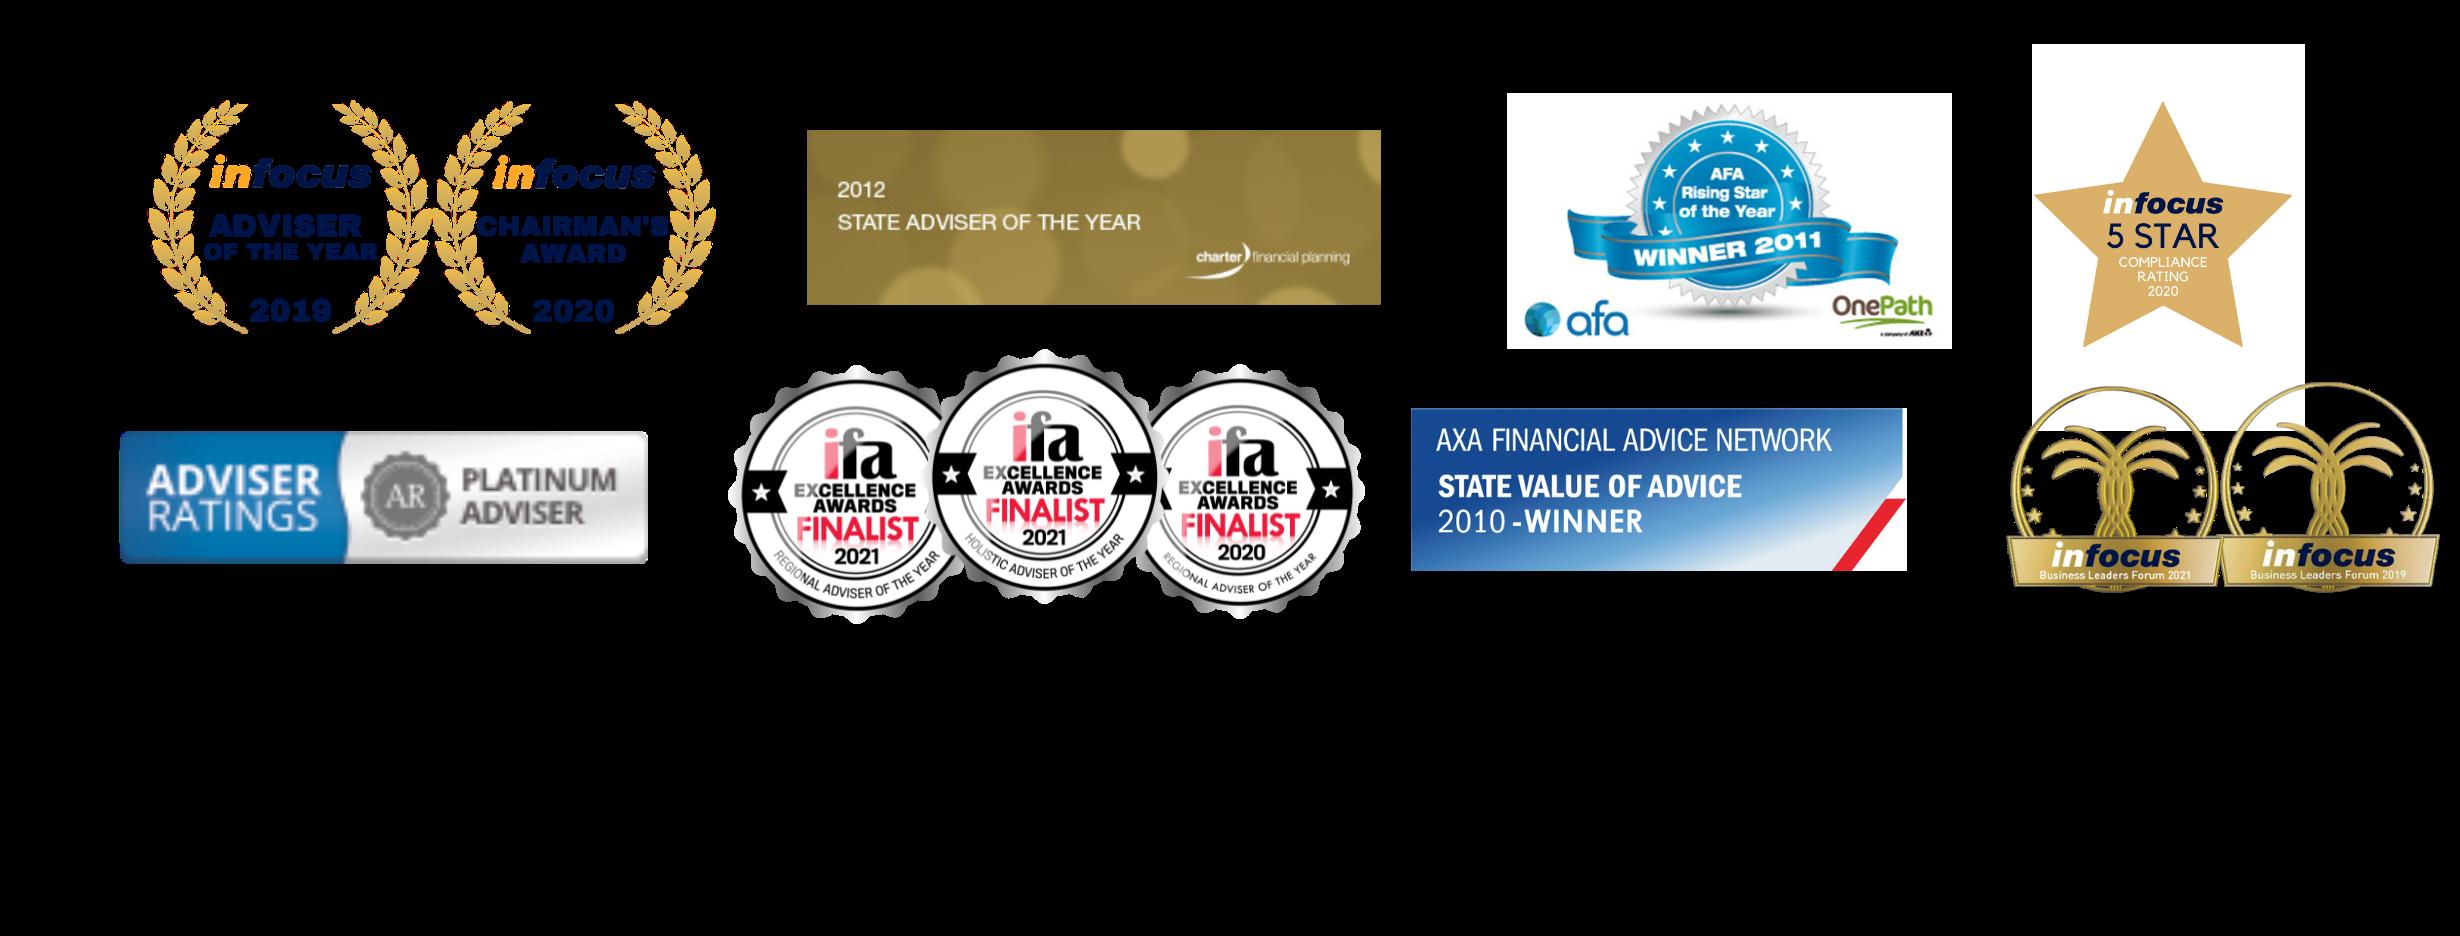 Award Winning Financial Advisers